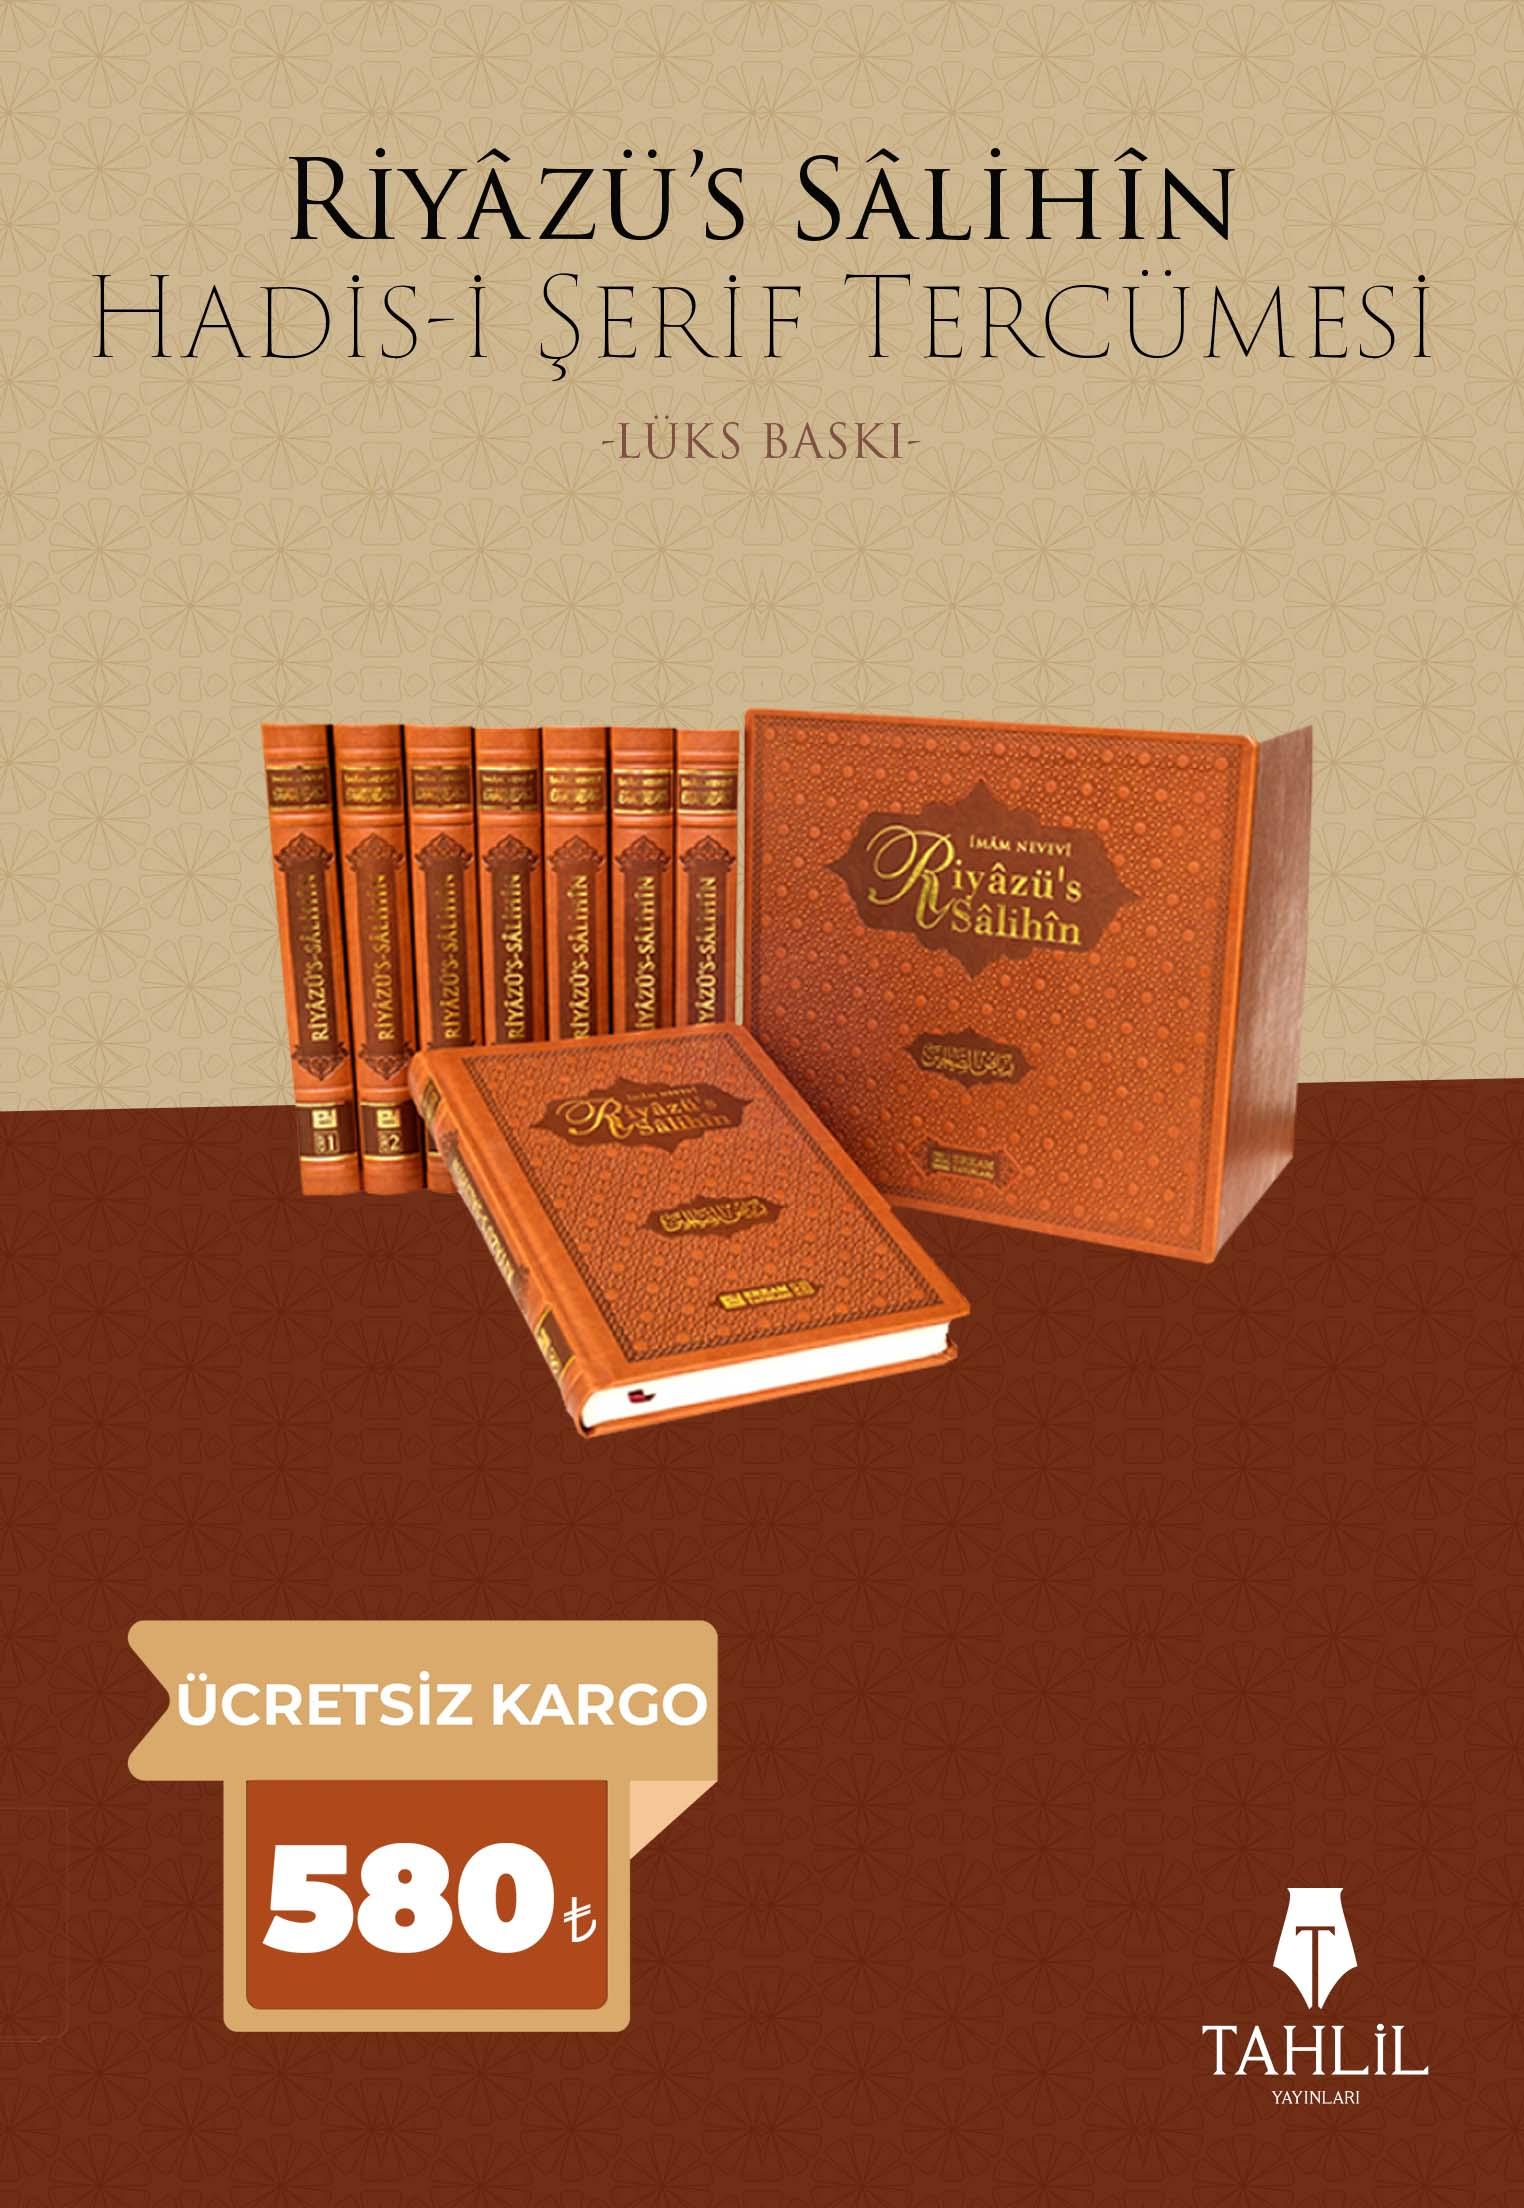 Lüks Baskı Riyâzü's-Sâlihin - Hadis-i Şerif Tercümesi - (8 cilt)